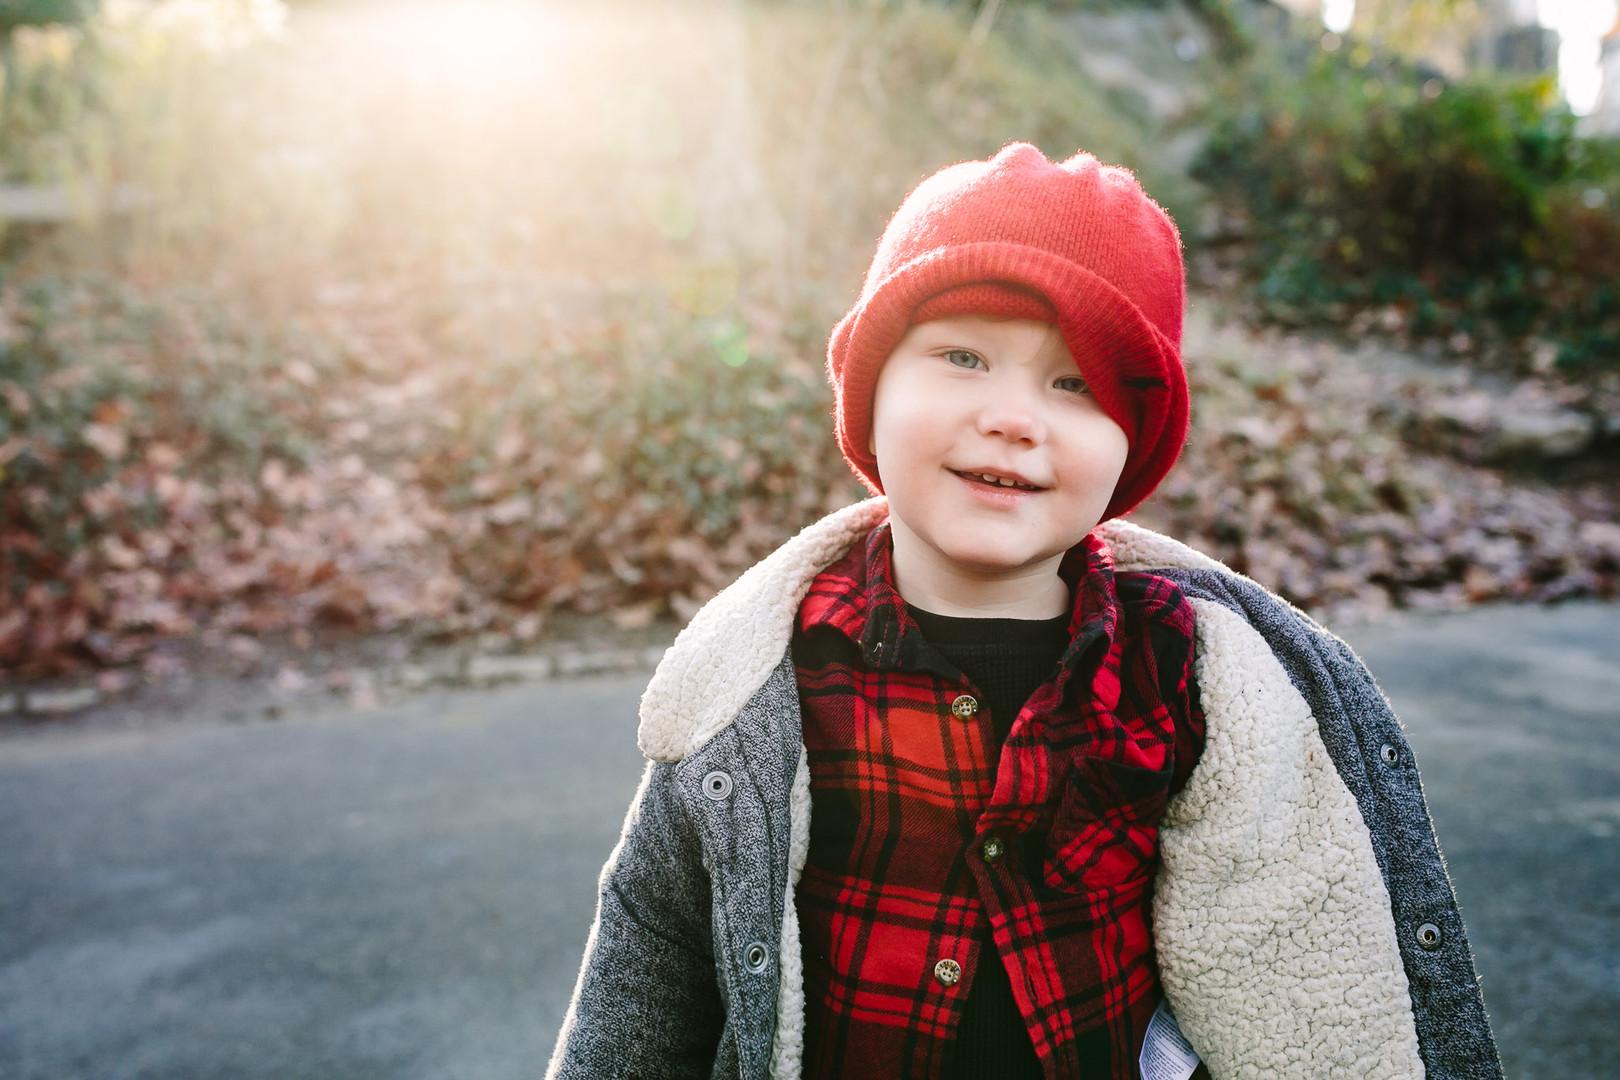 efp-toddler-boy-red-beanie-horizontal-ce